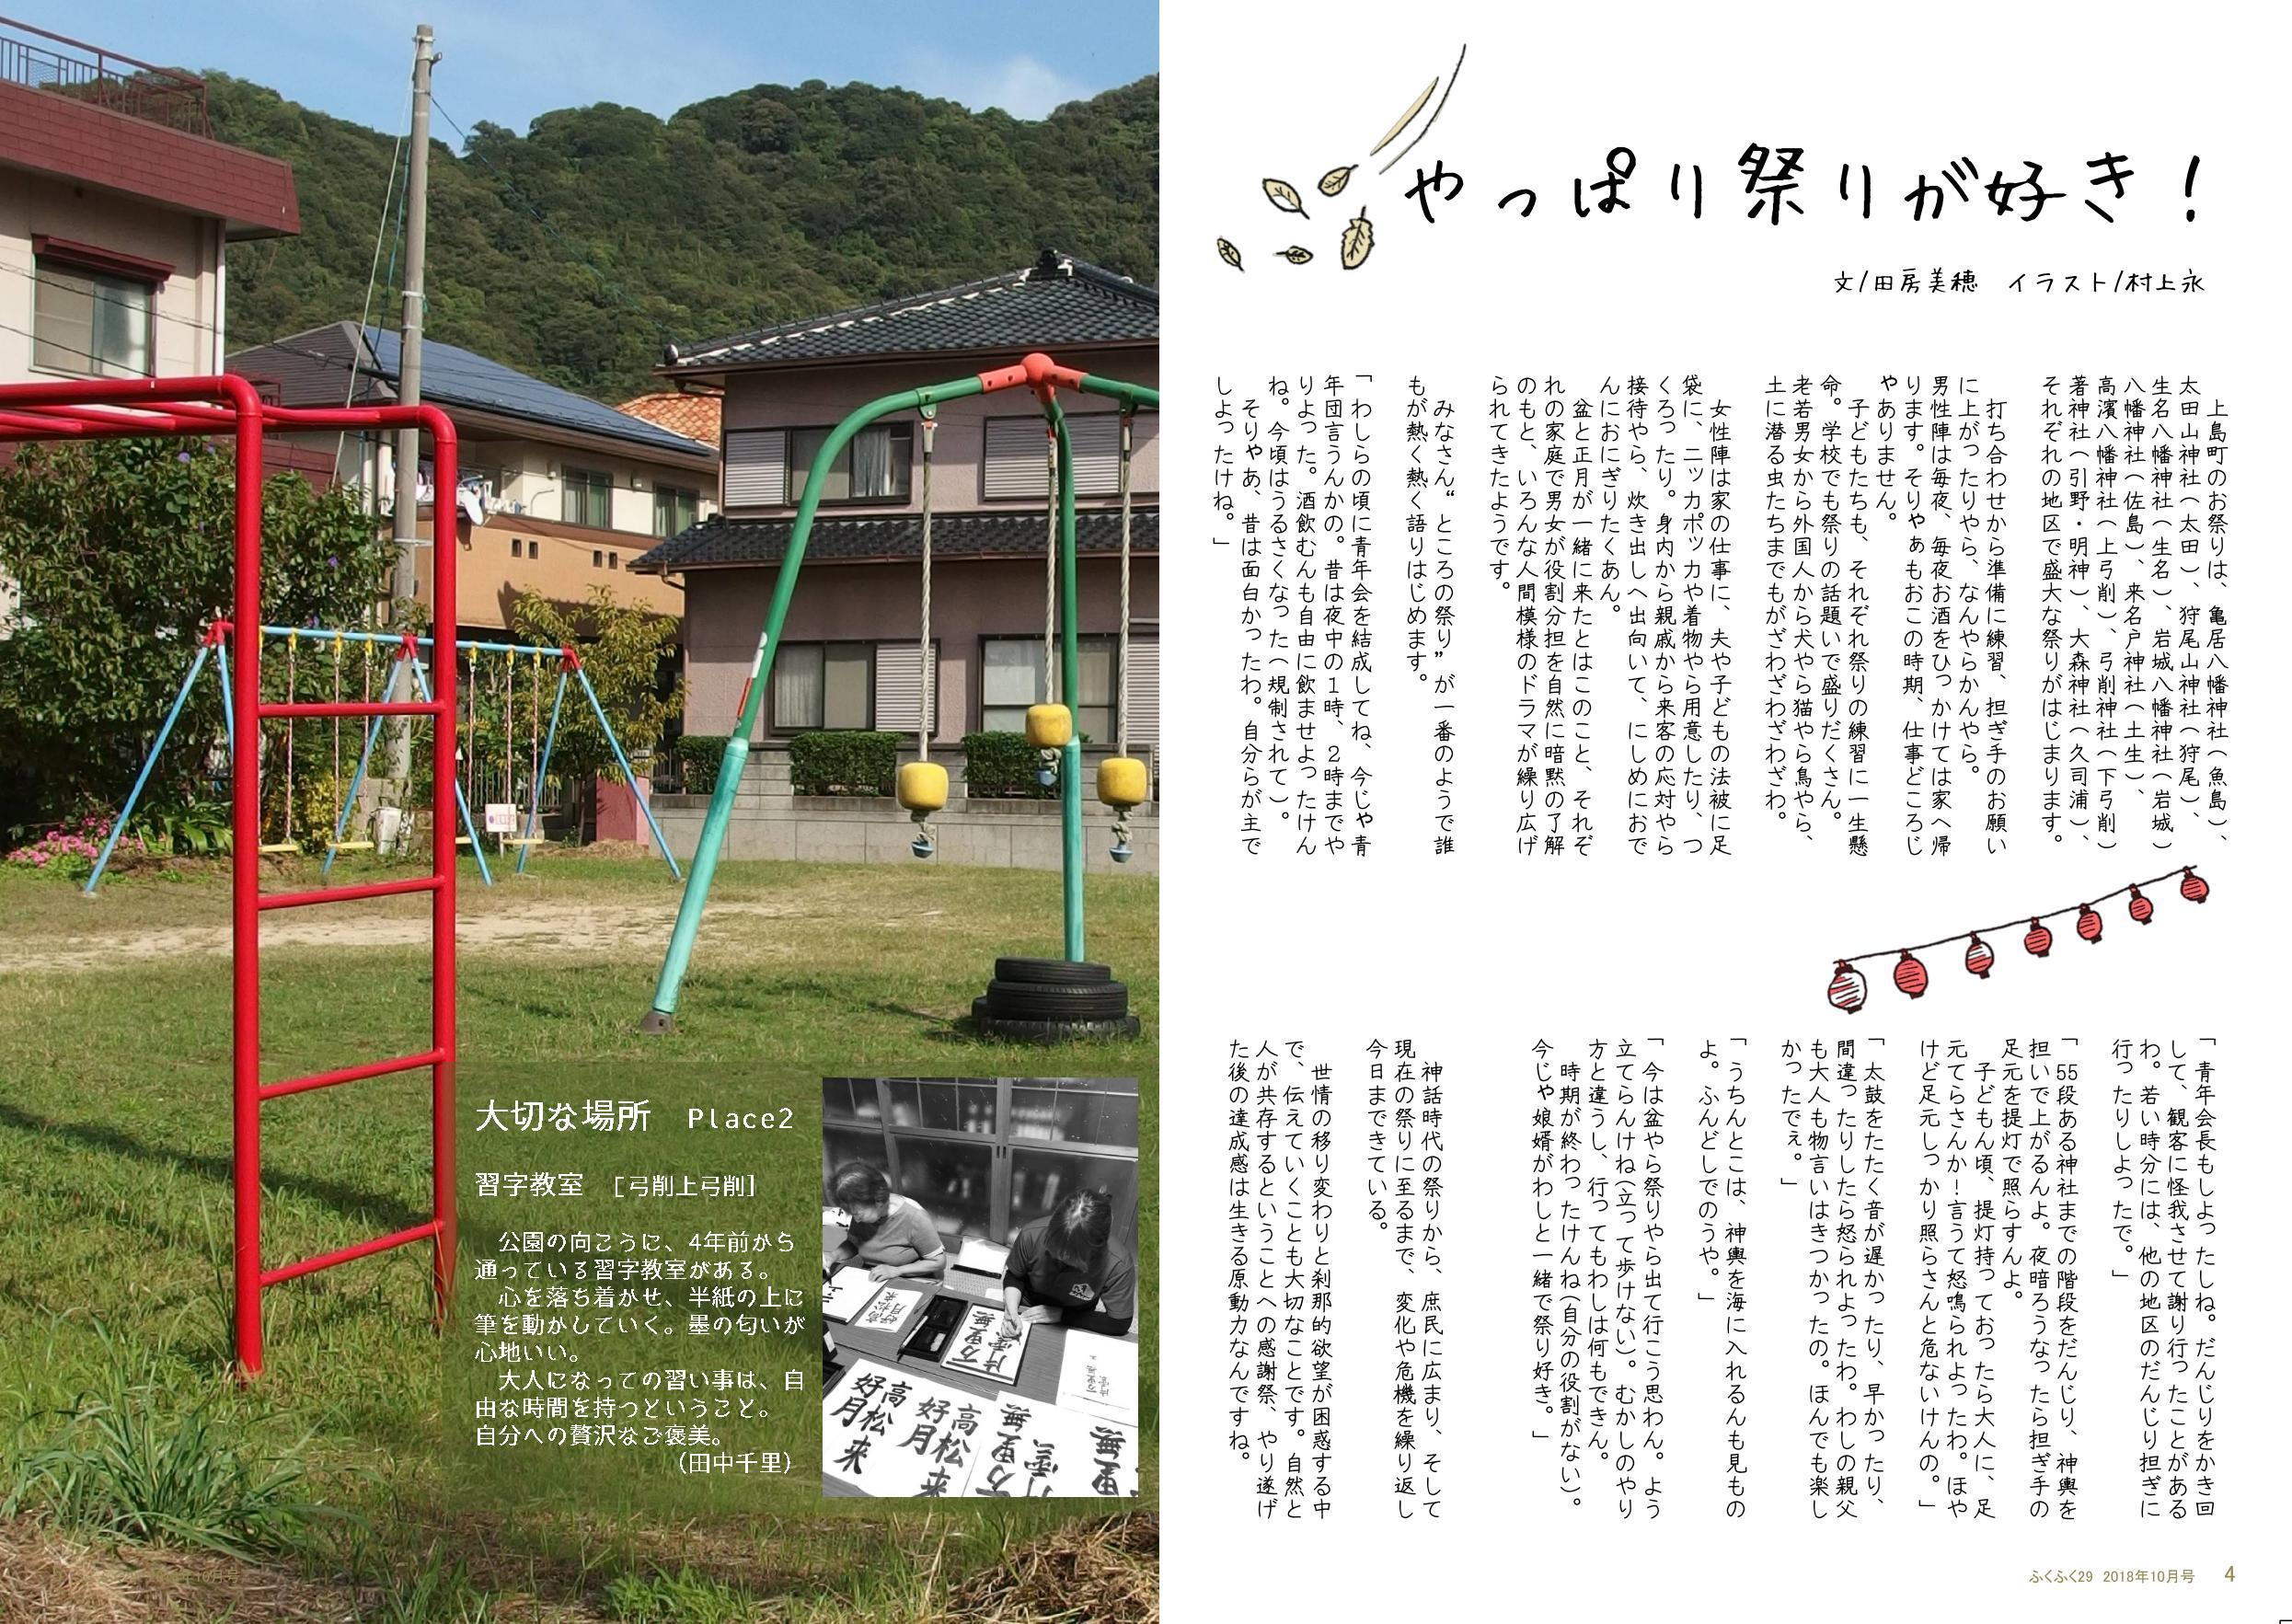 http://fukufukunokai.com/newsletter/images/%E5%85%A5%E7%A8%BF%E3%83%87%E3%83%BC%E3%82%BF_cropped_3.jpeg